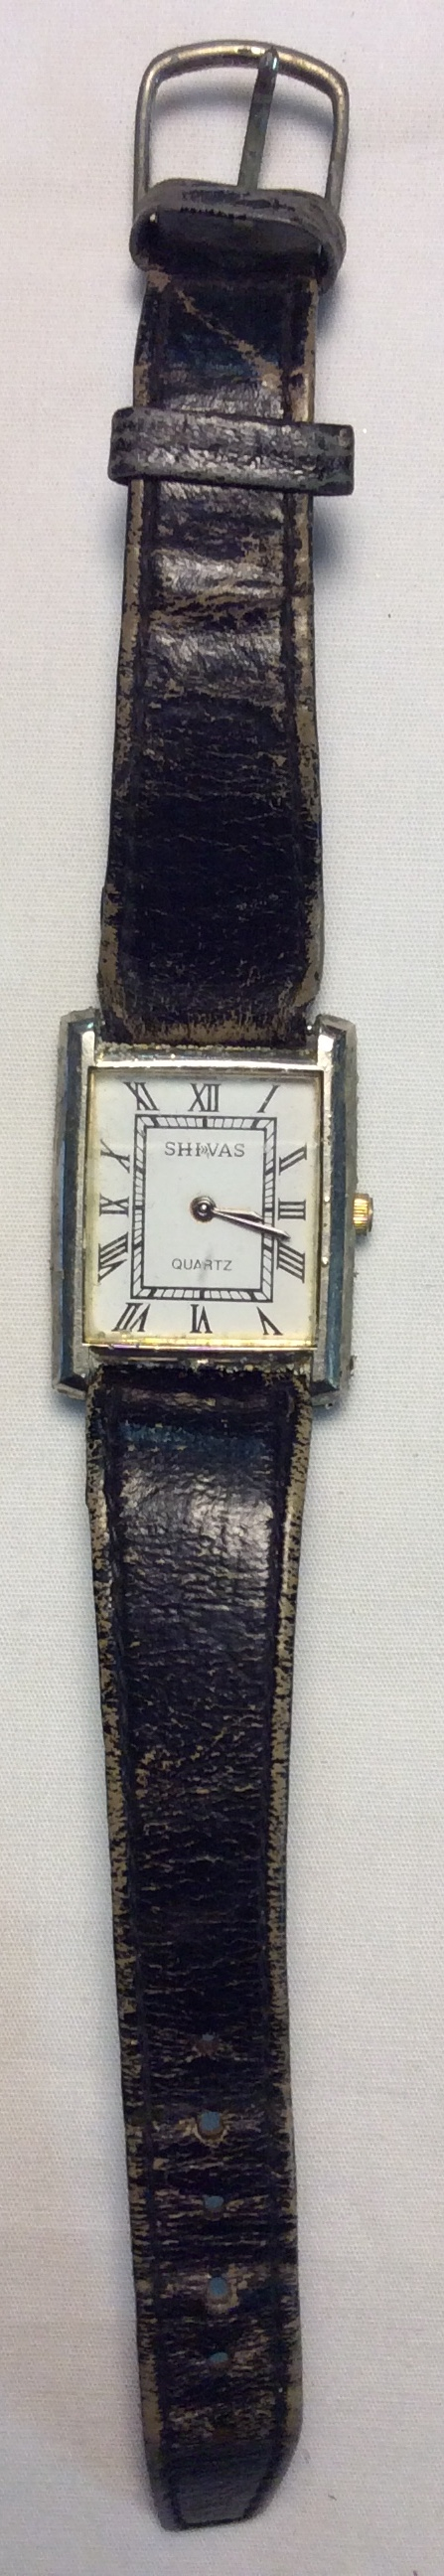 Shivas watch - square white face